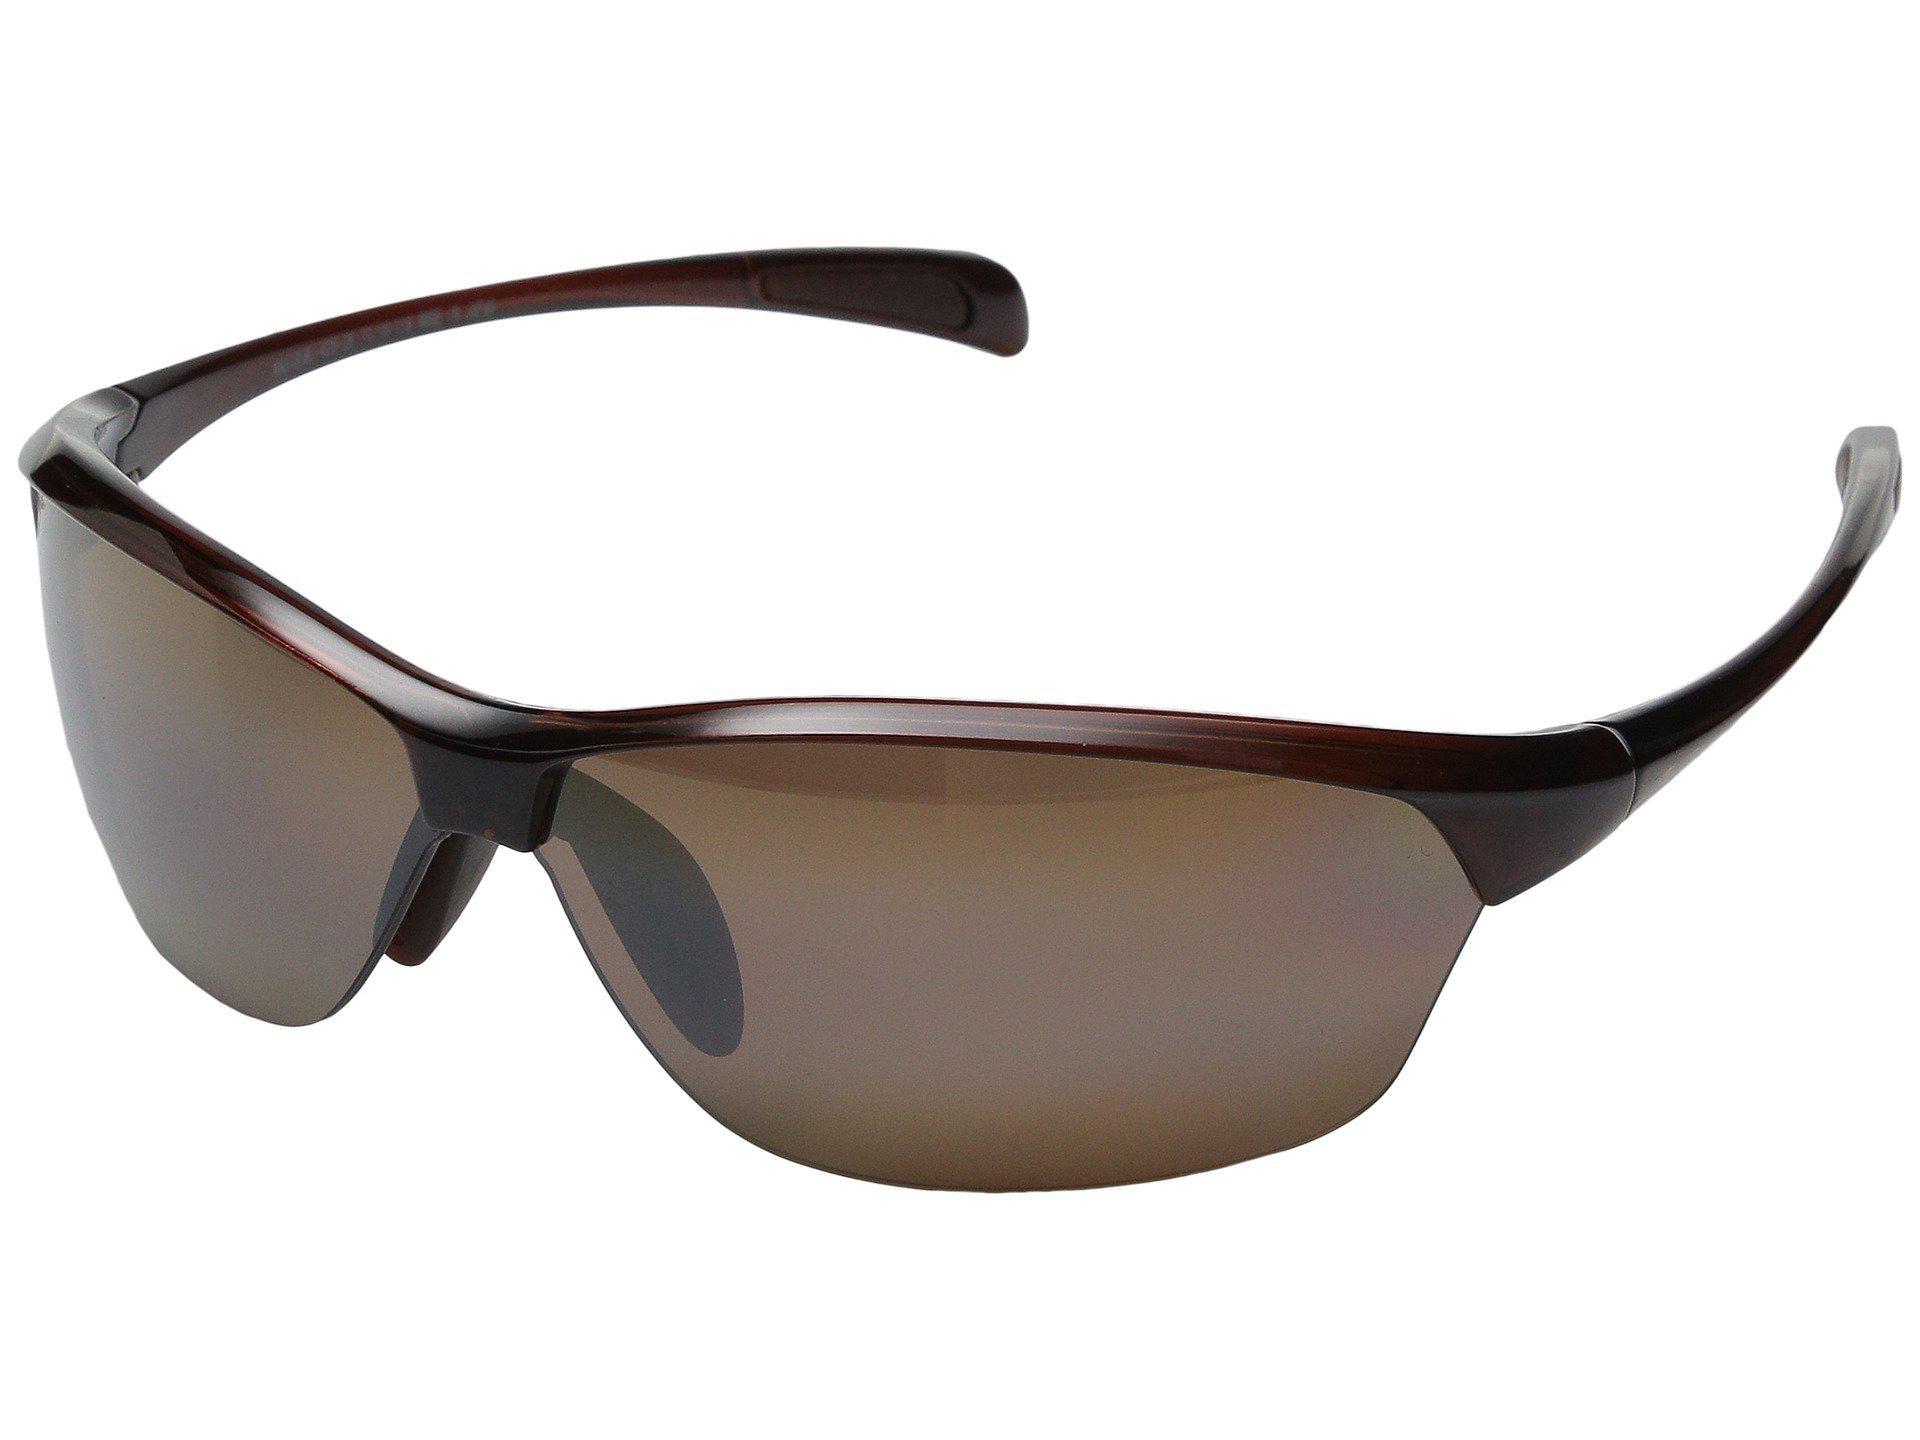 1408dac9fe4 Maui Jim. Women s Red Hot Sands (rootbeer hcl Bronze) Plastic Frame Sport  Sunglasses